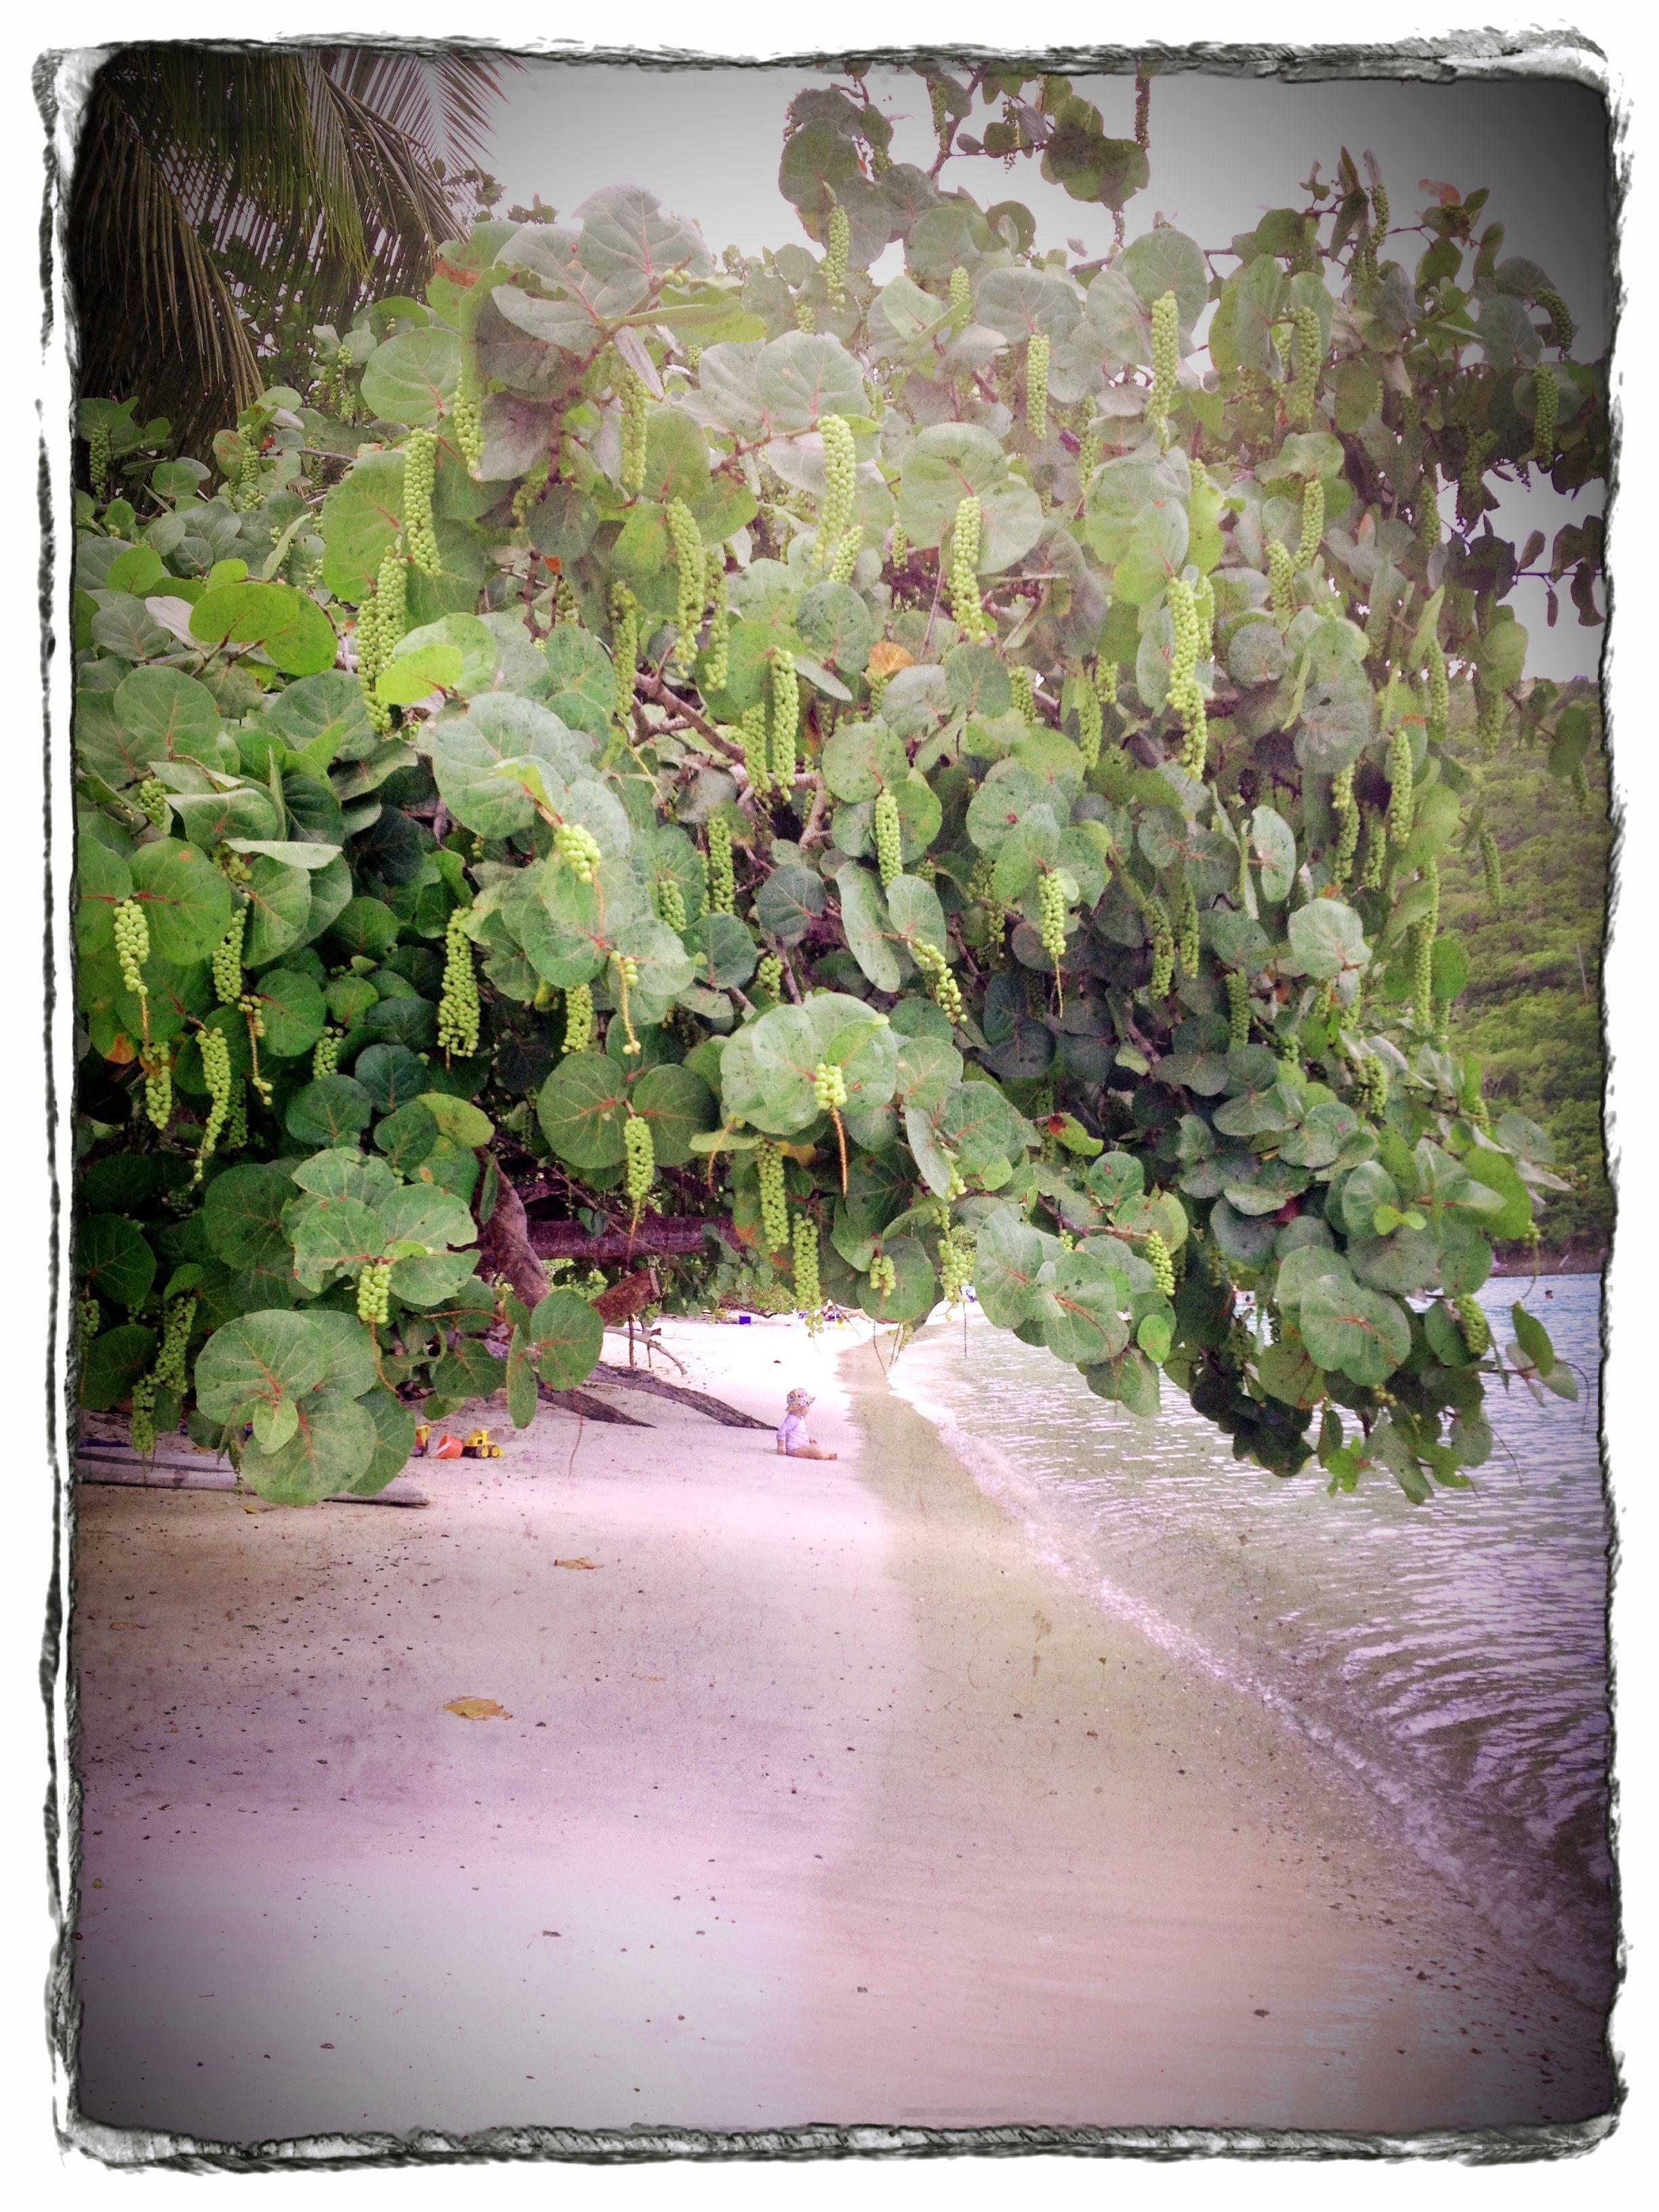 tashi under the magic tree